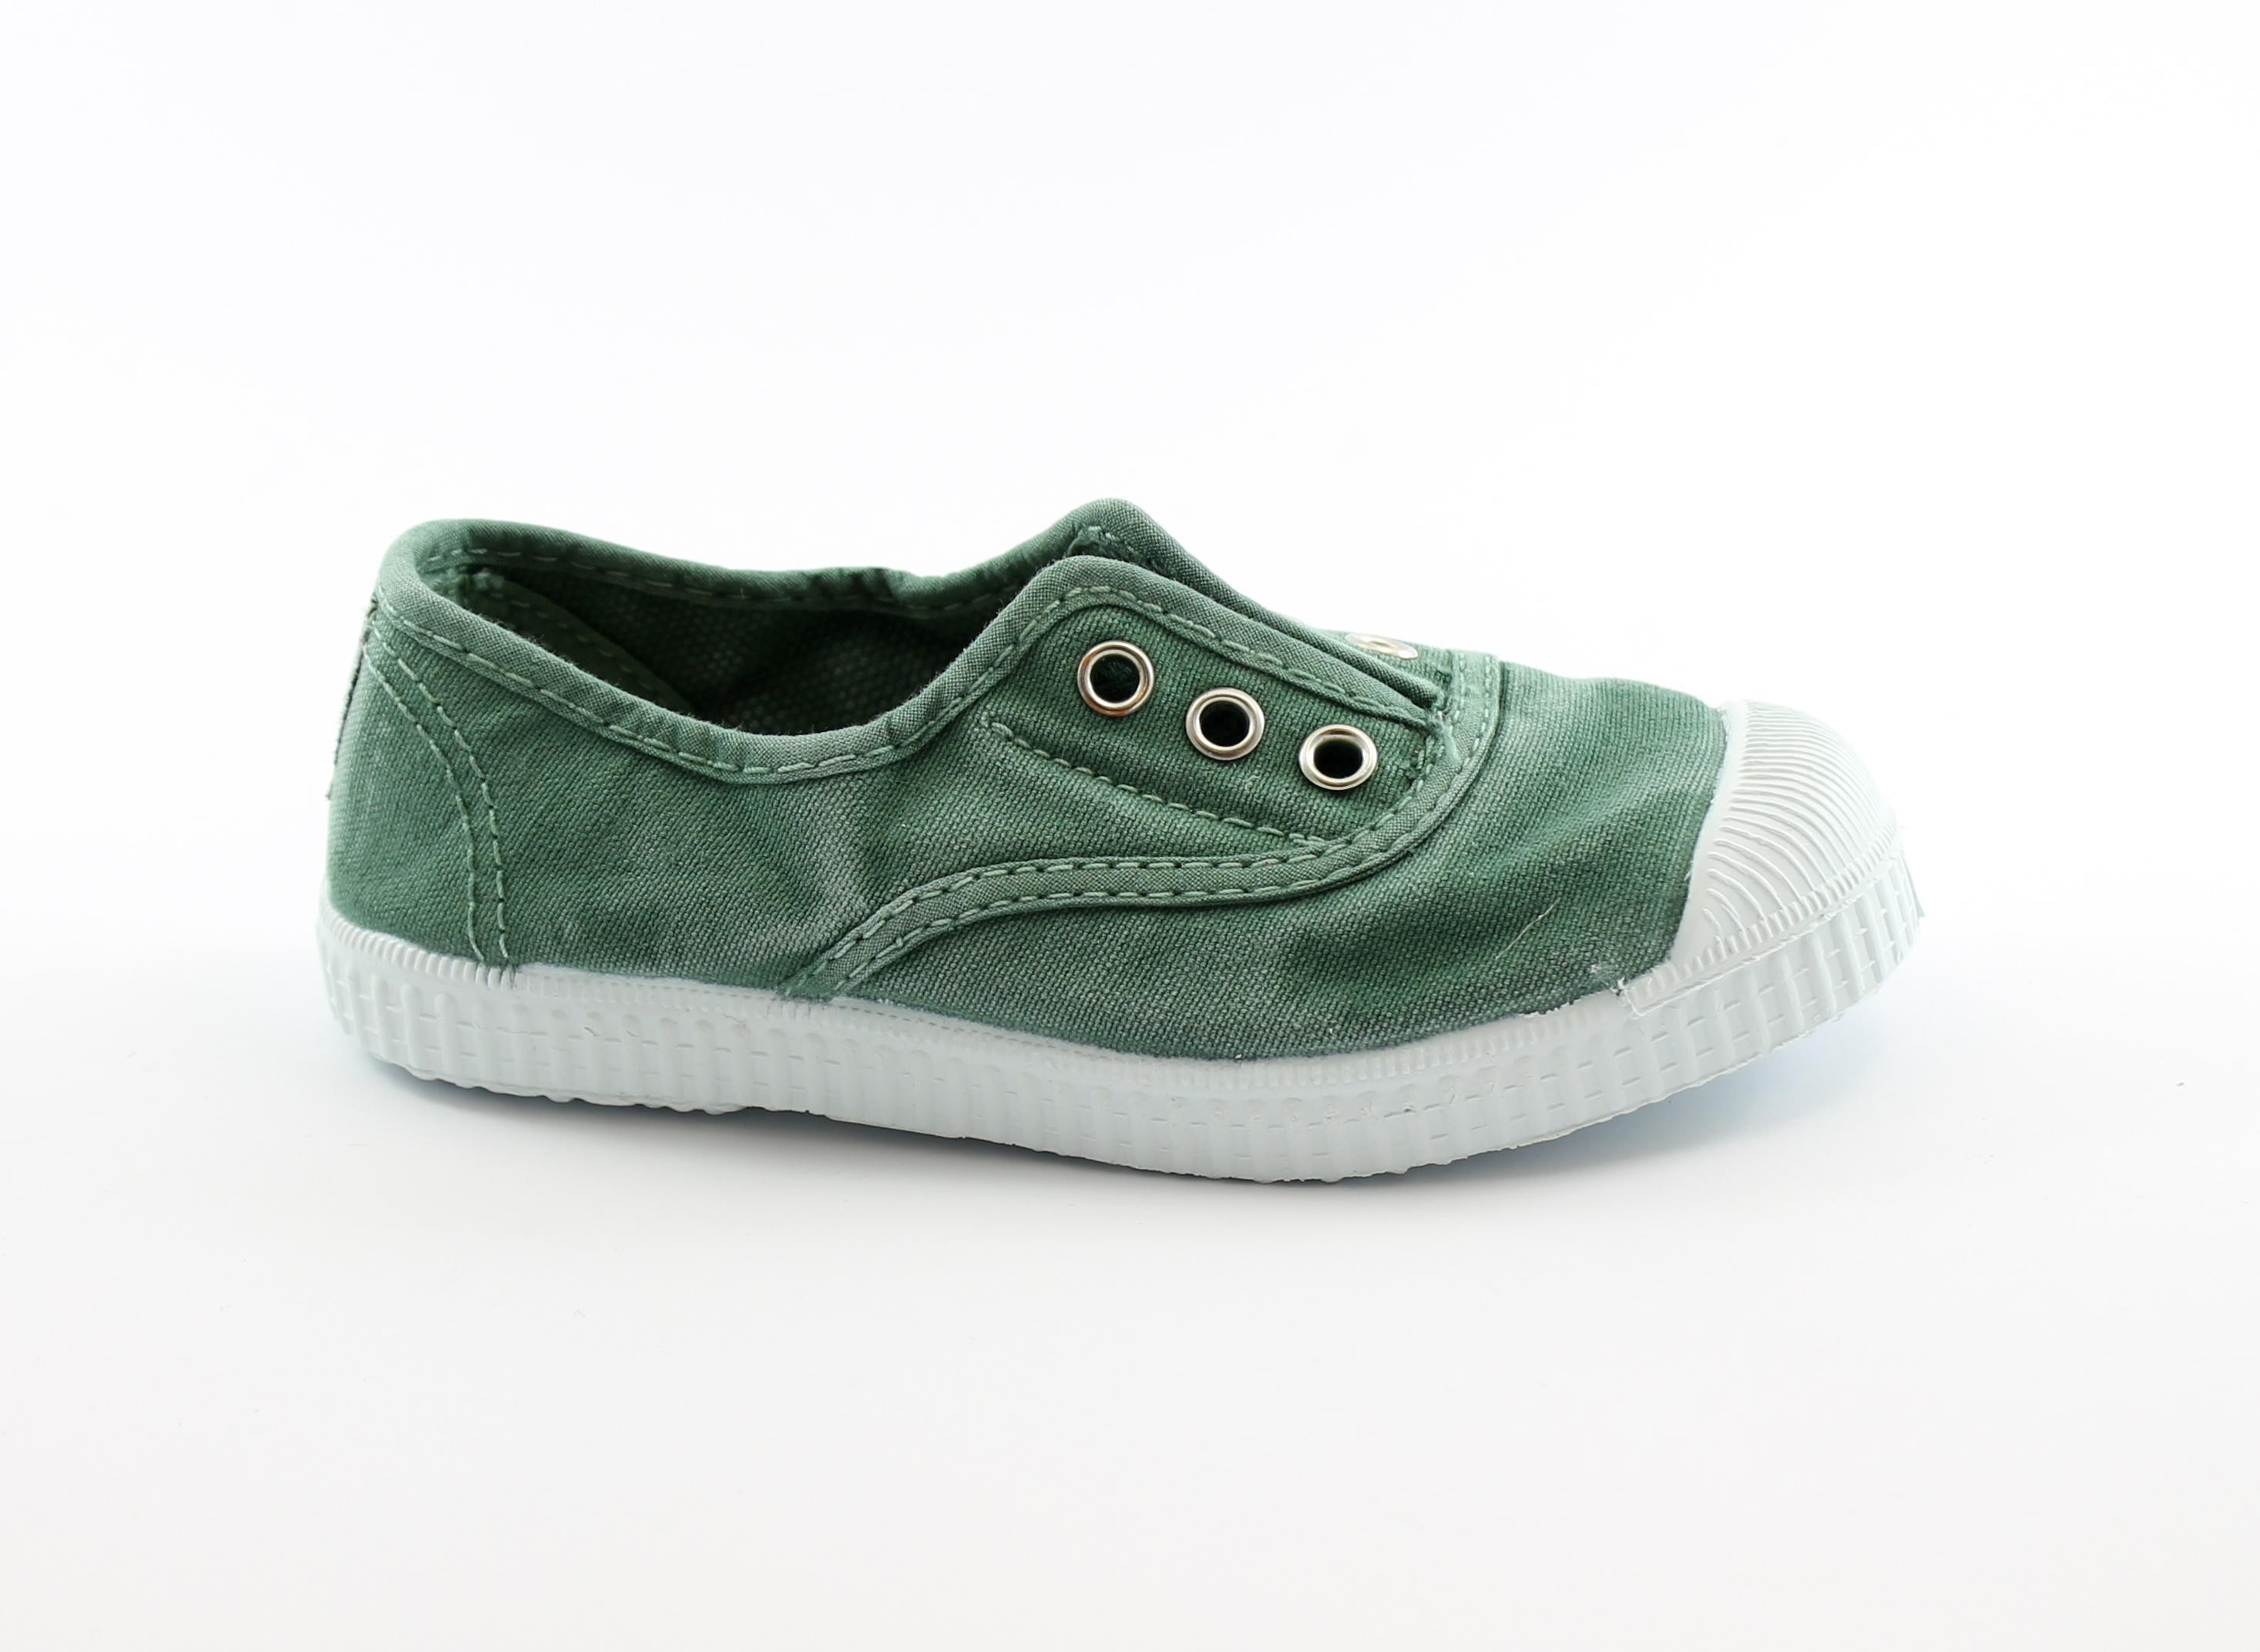 CIENTA 70777 189 22/33 albahaca verde scarpe unisex elastico tessuto bambino